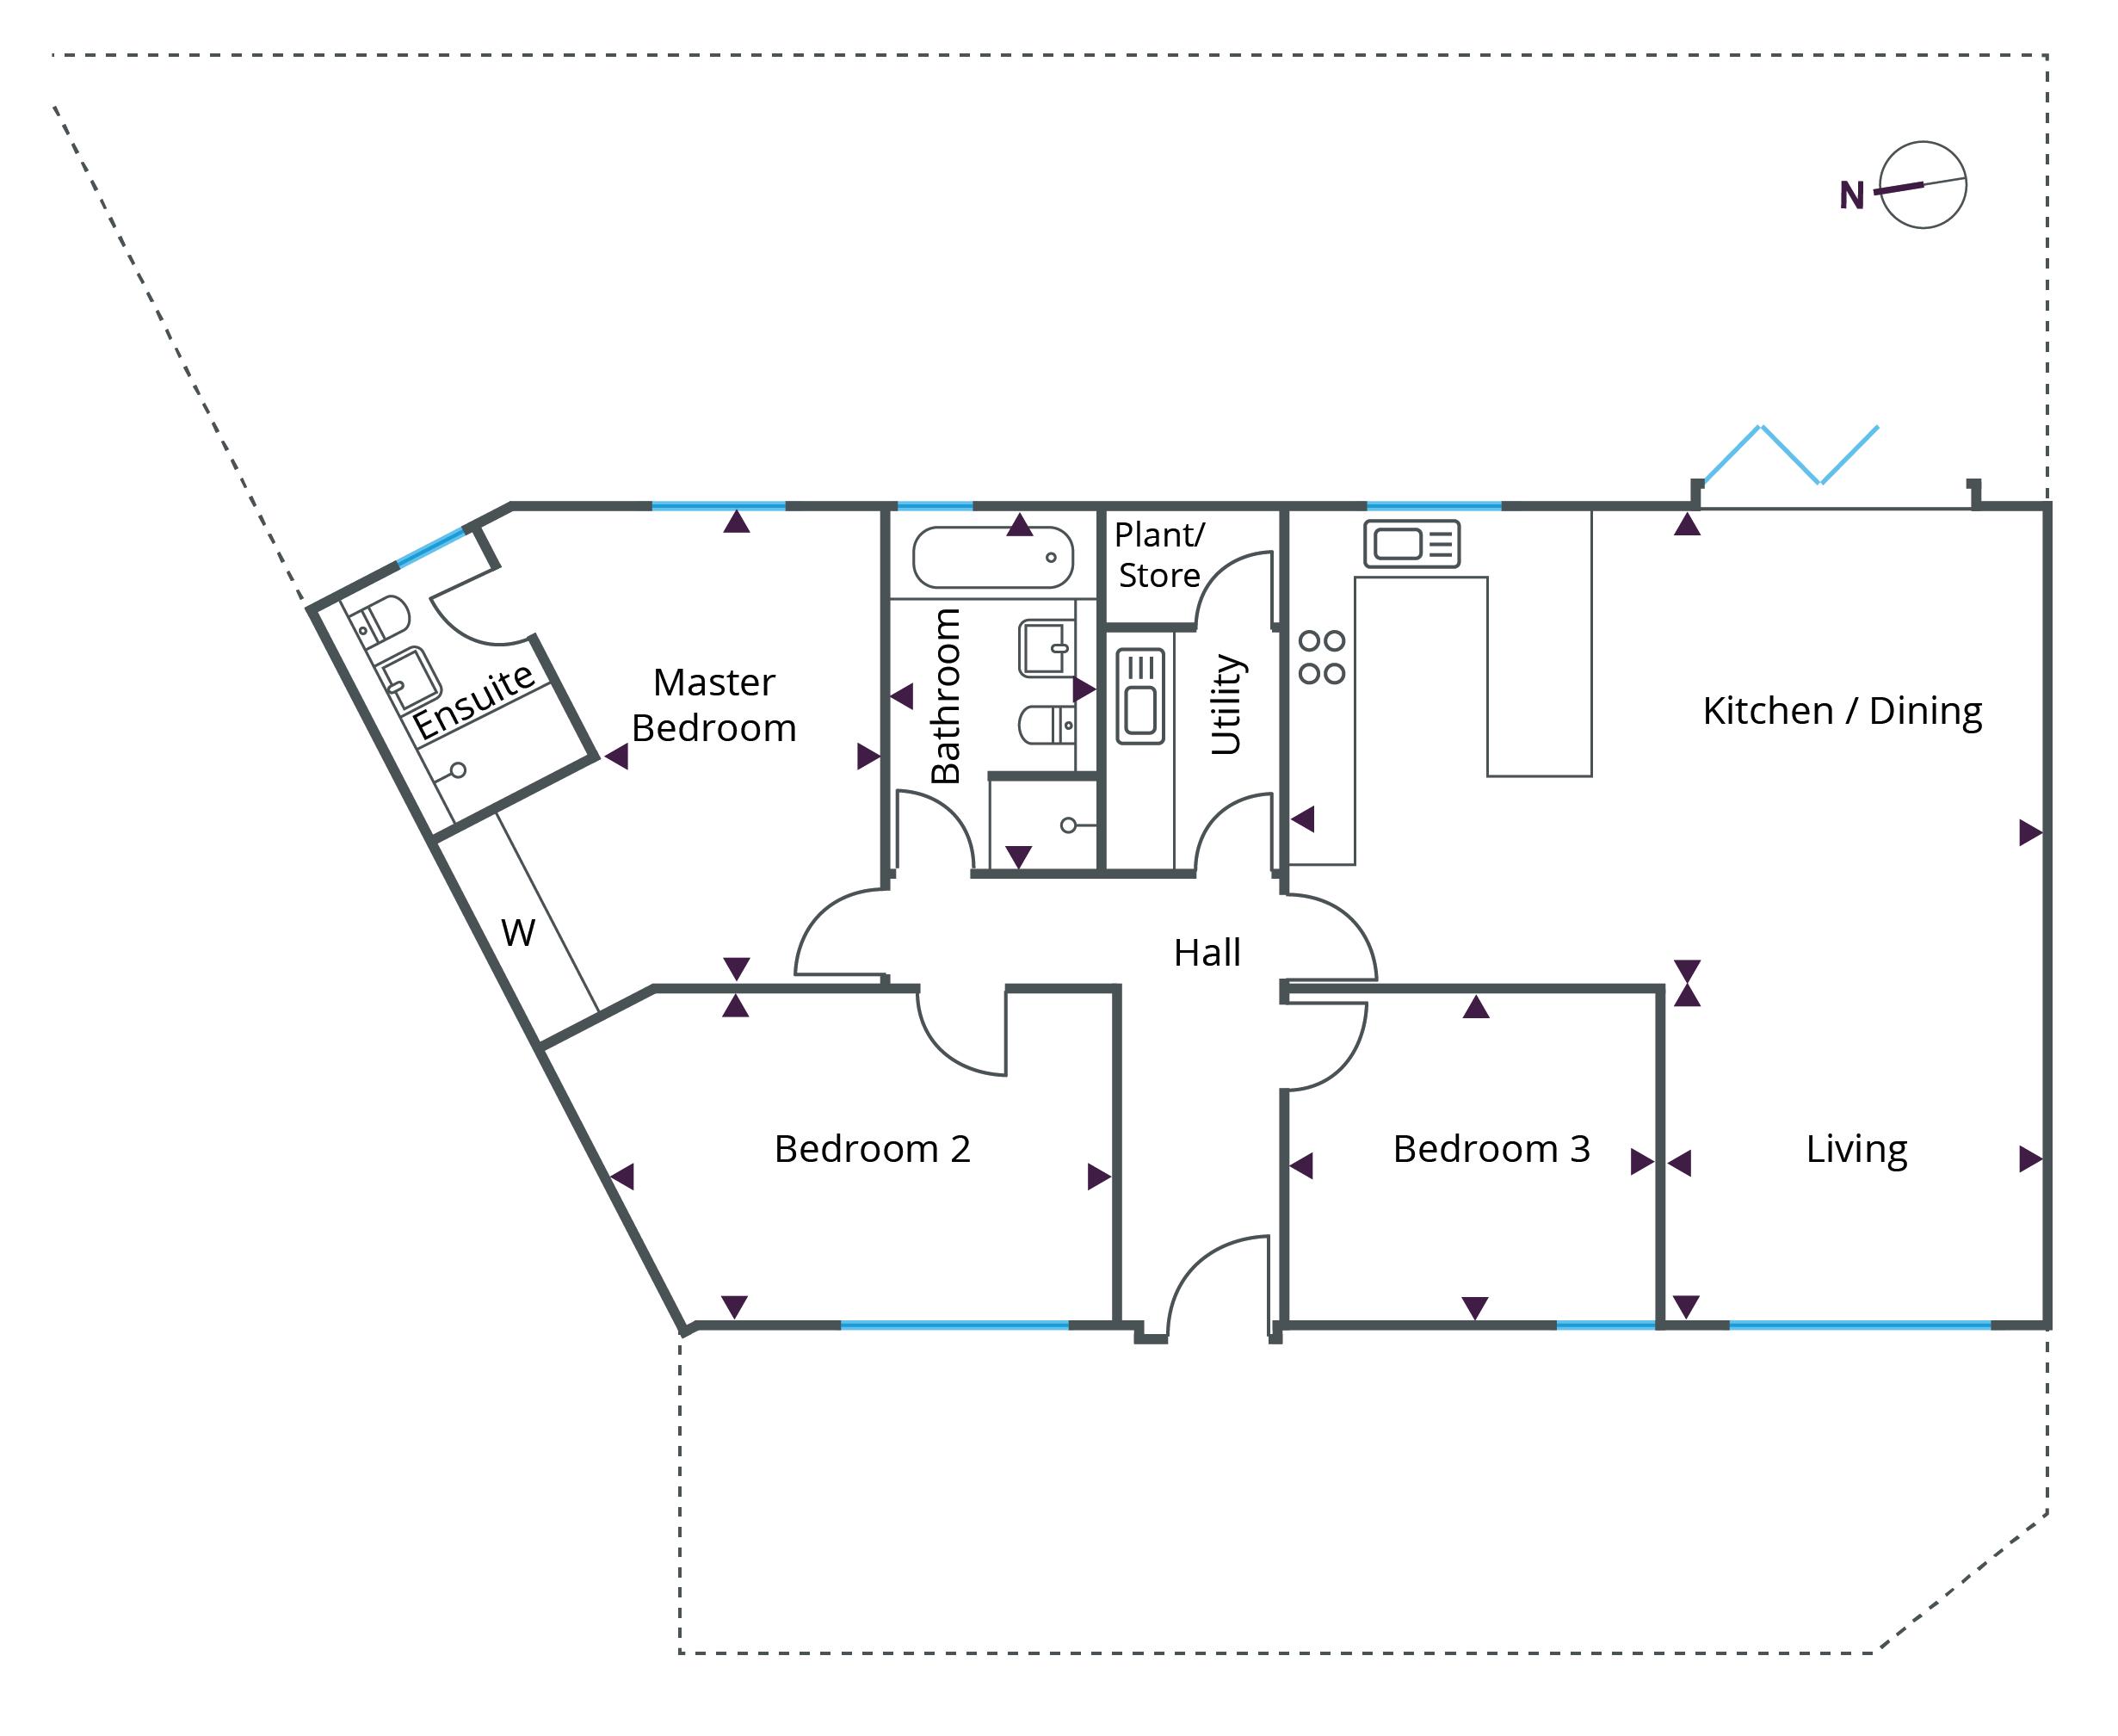 Floorplan for Bungalow 3